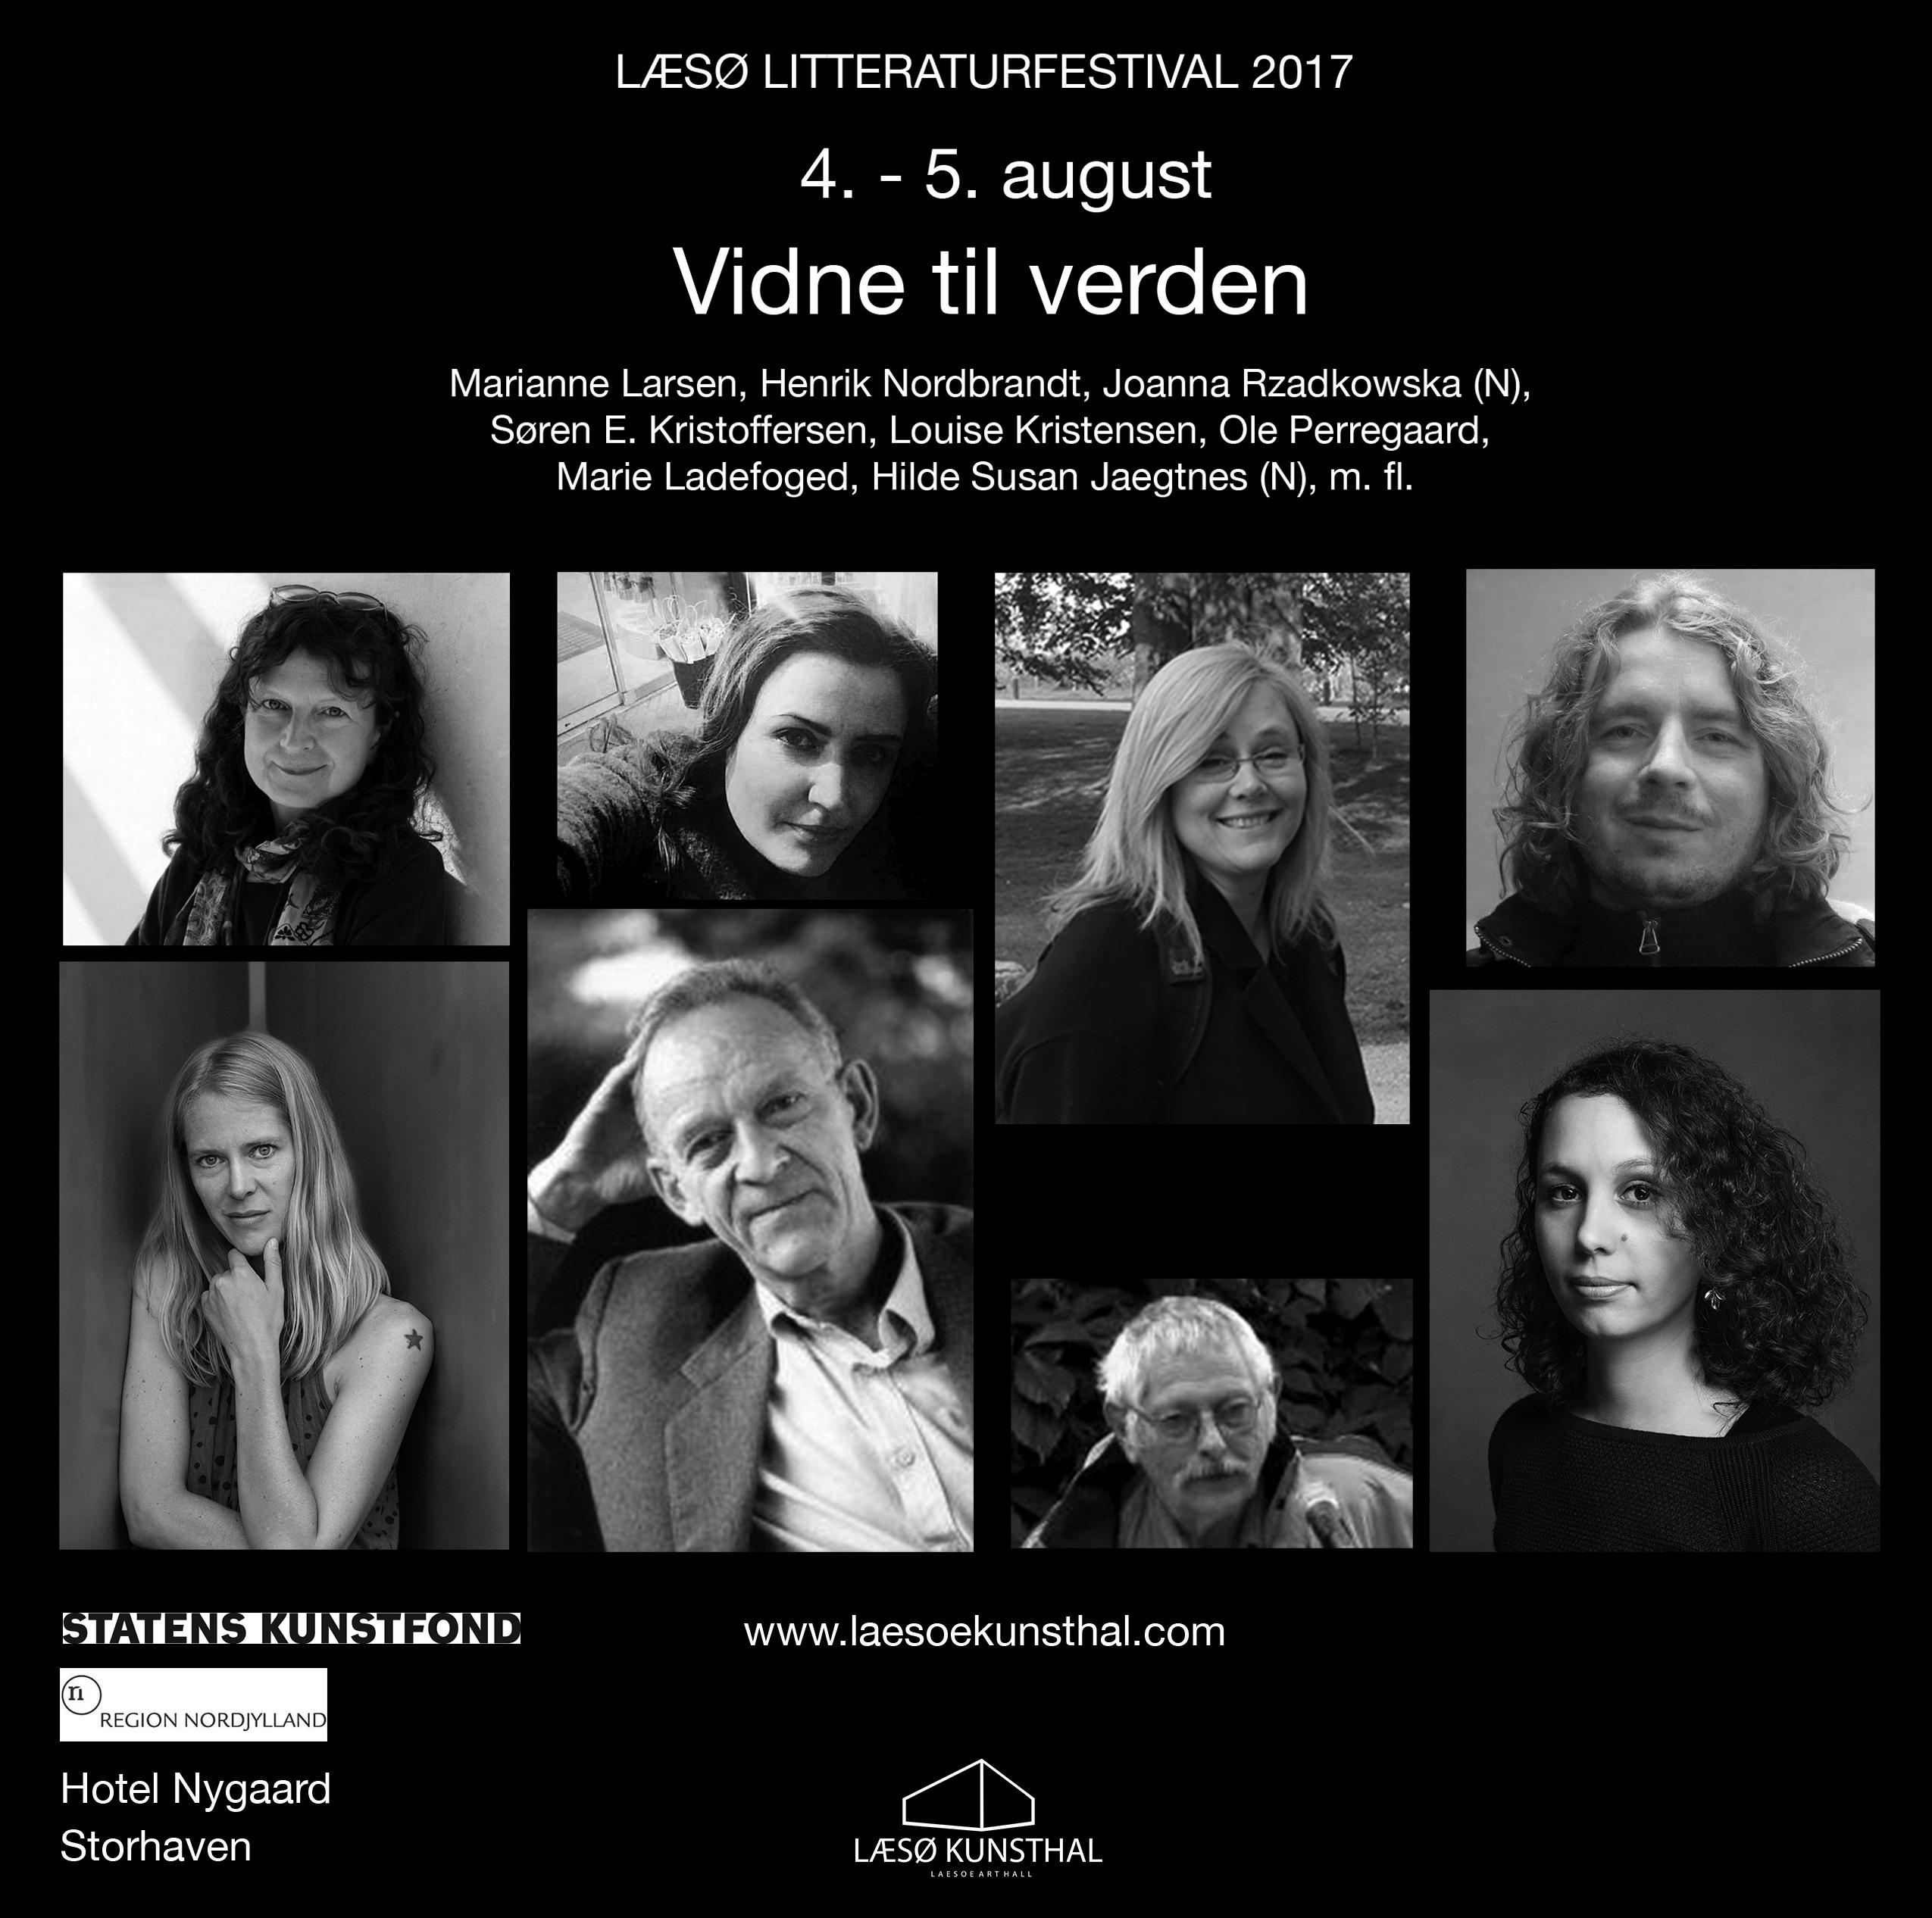 Læsø Litteraturfestival 2017